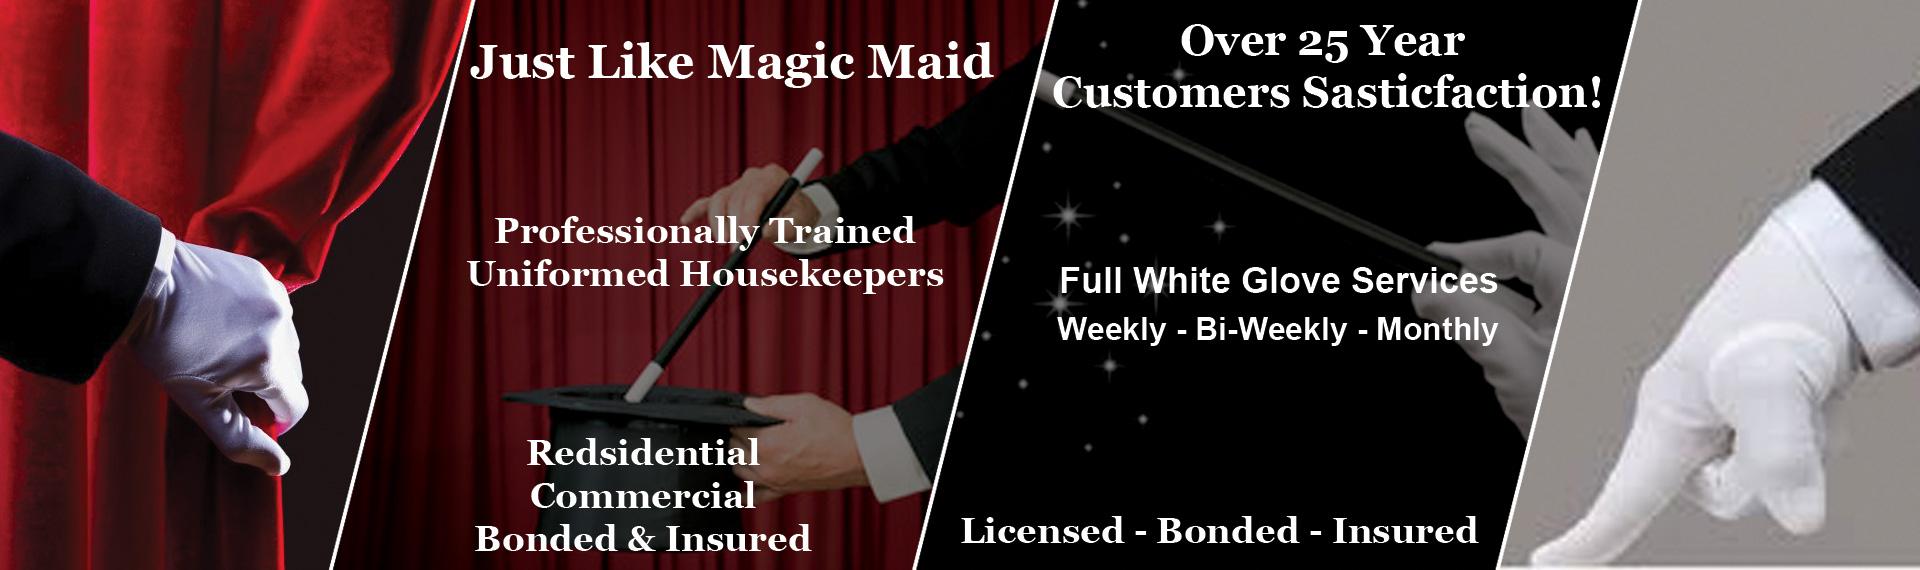 Just Like Magic Maids Venice LA